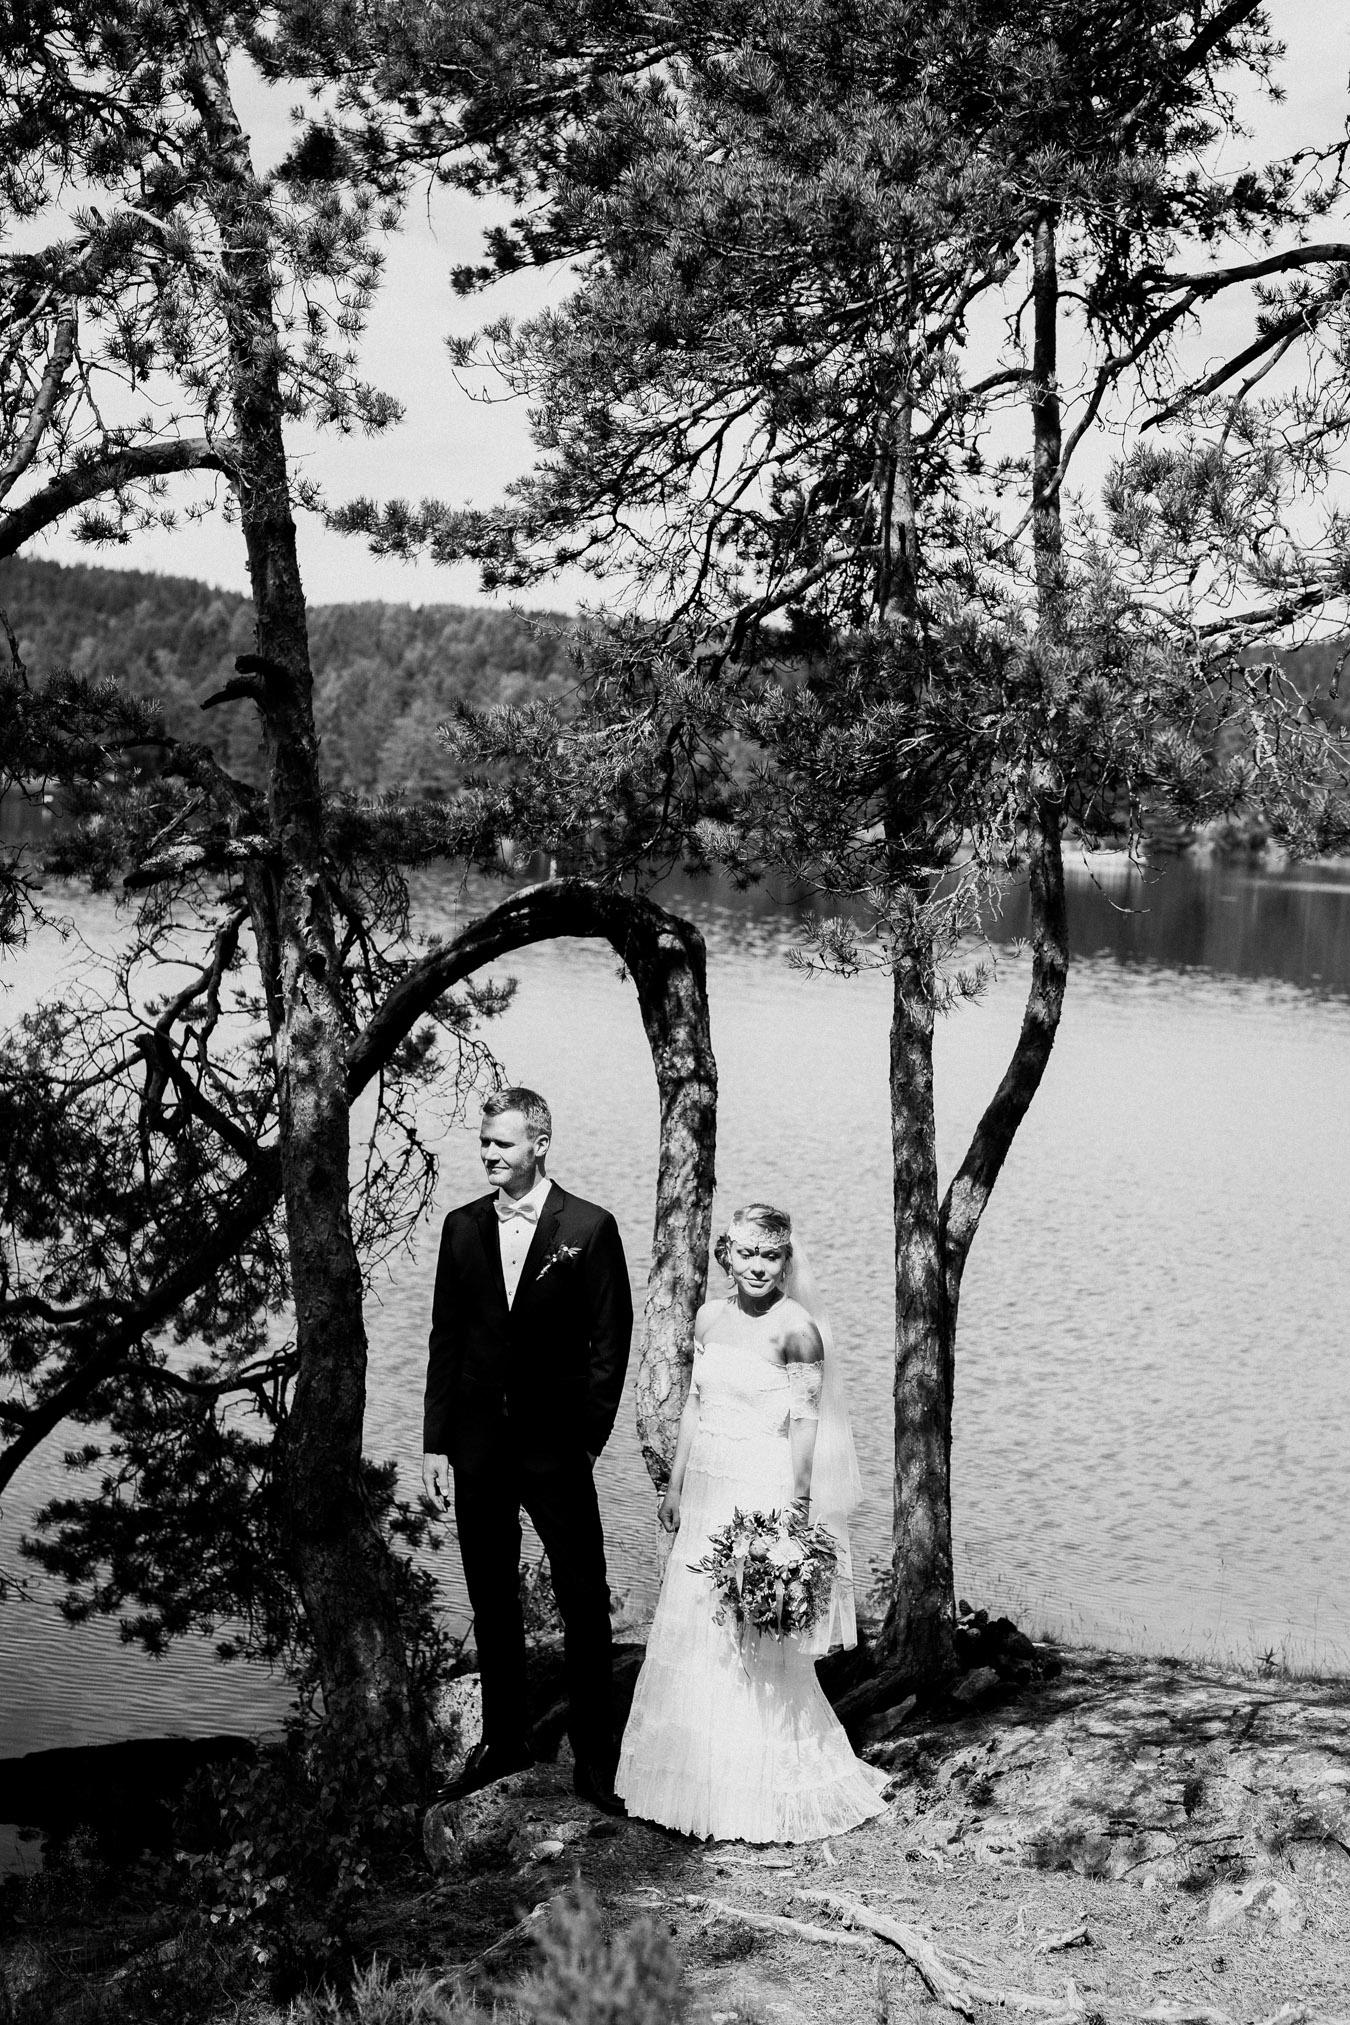 Fotograf-Tone-Tvedt-bryllup-189.jpg